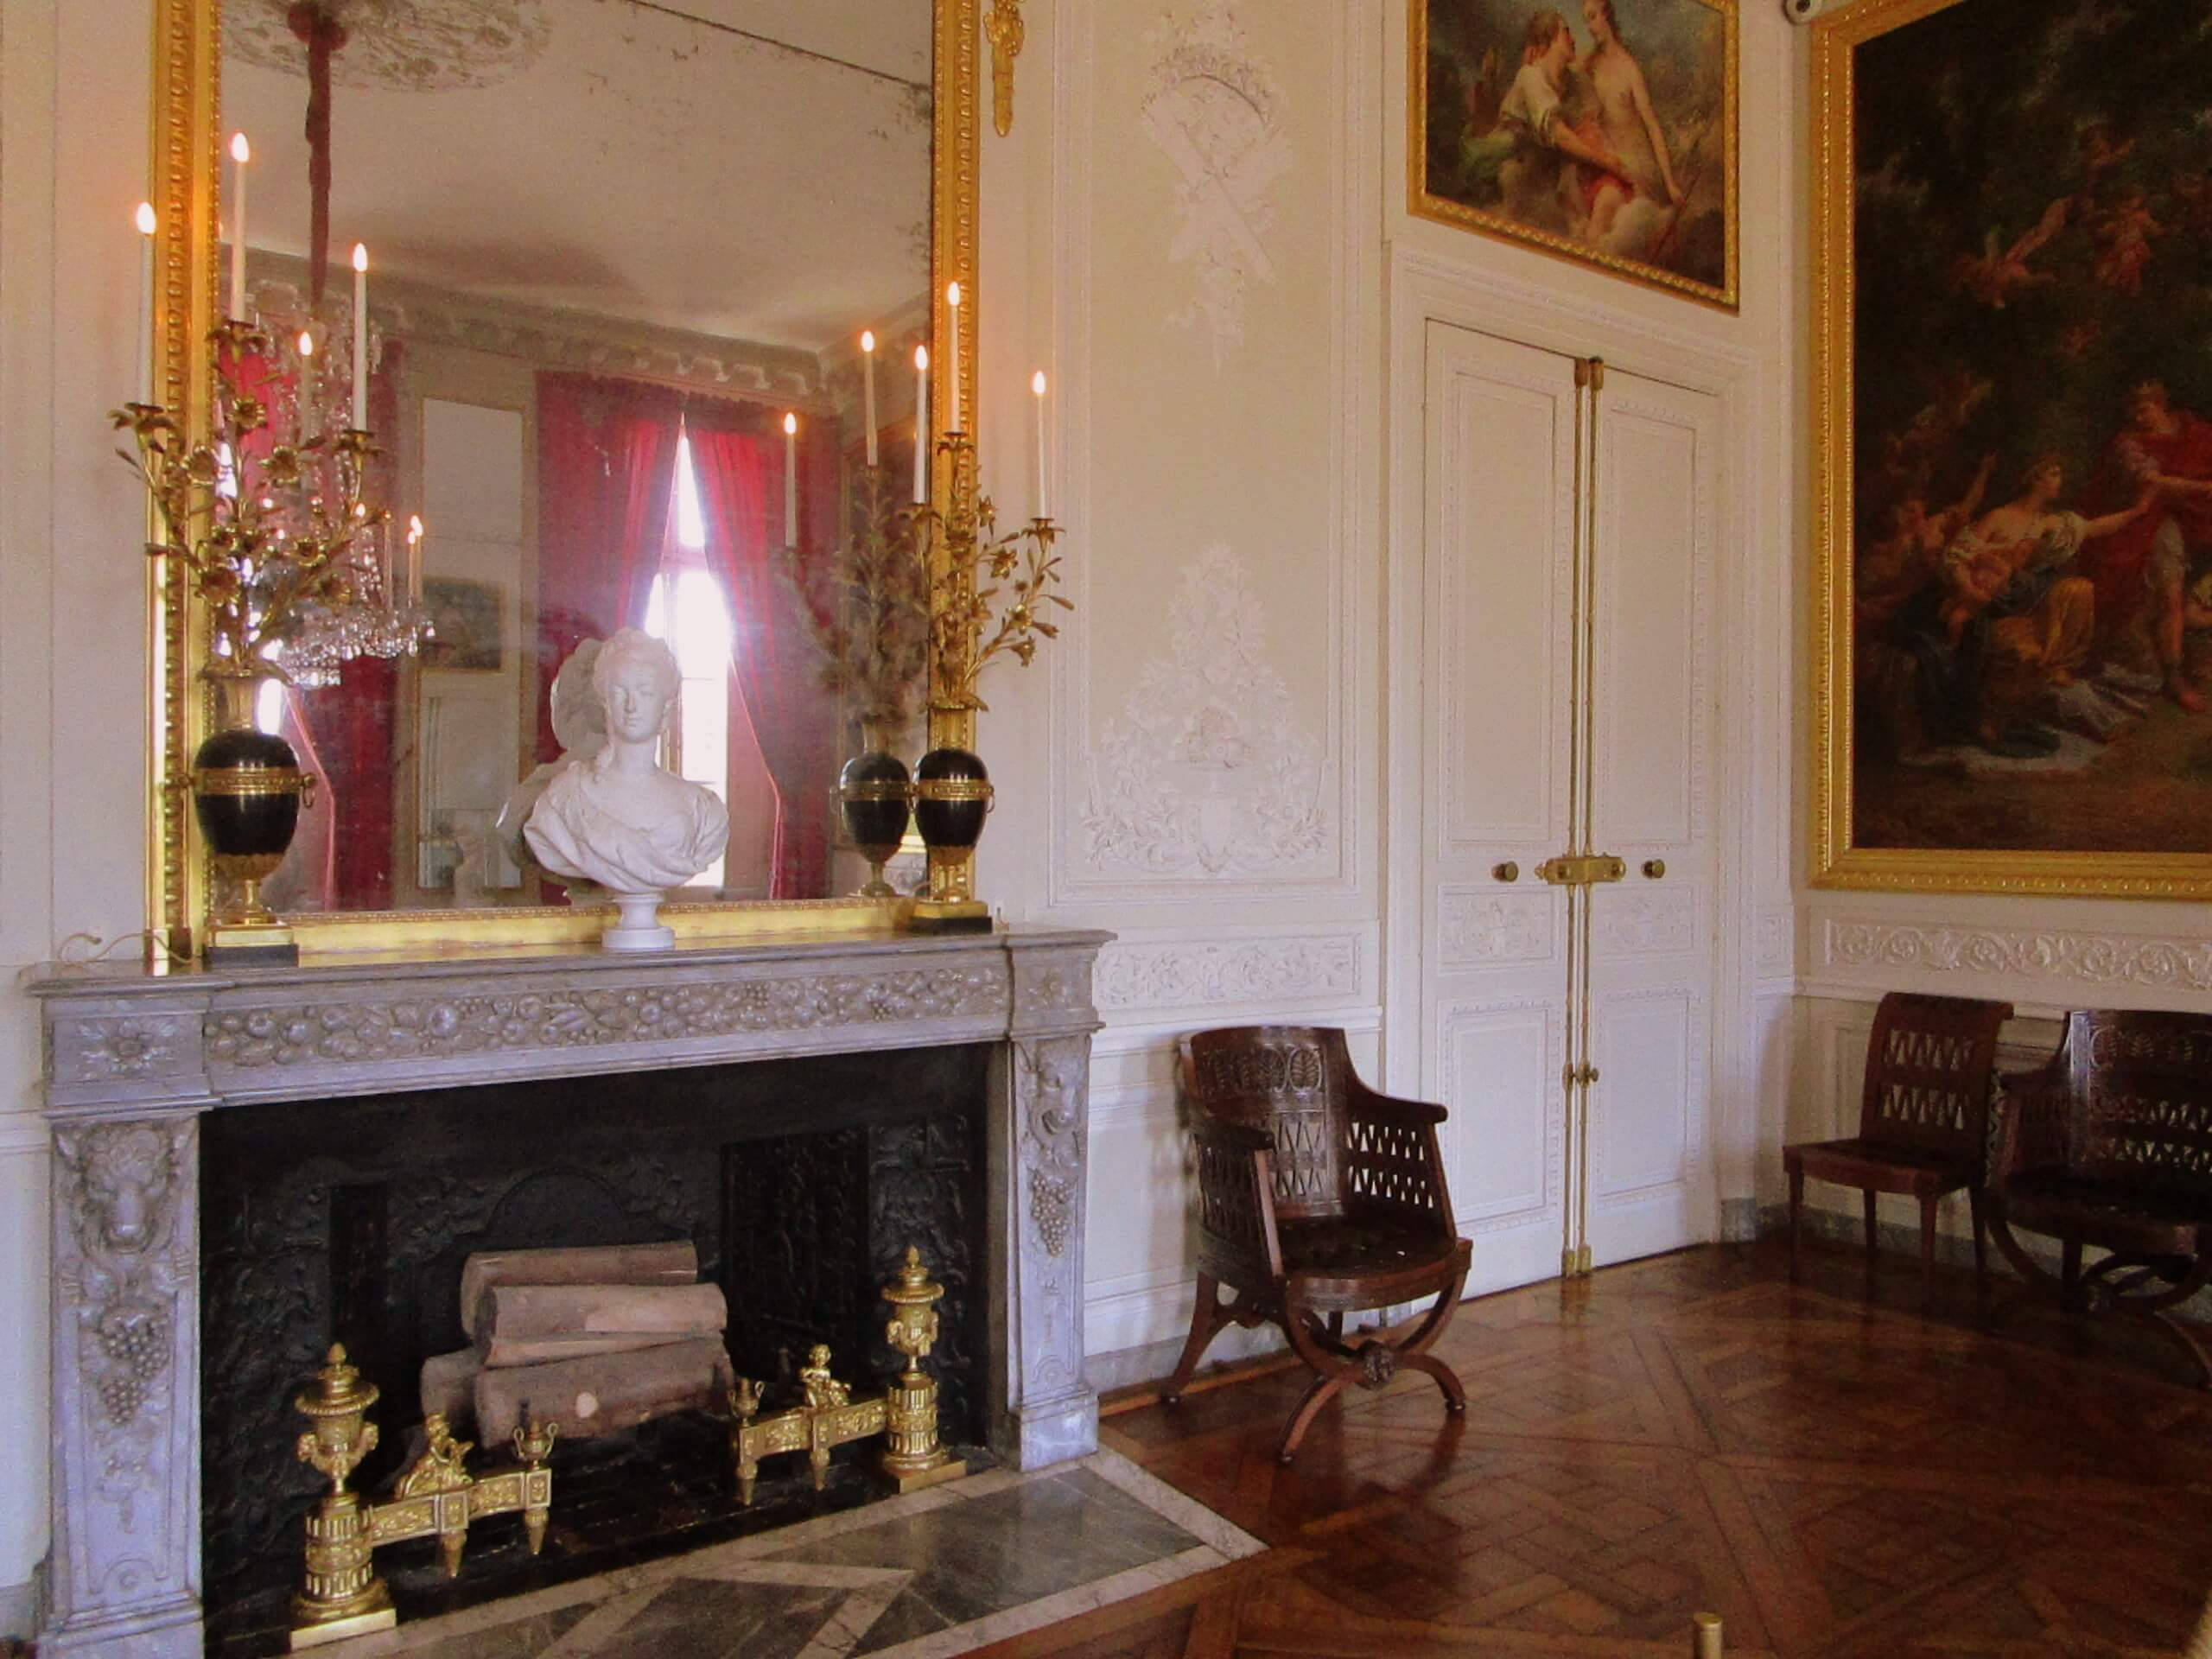 Marie Antoinettes Estate, salon of the Petit Trianon